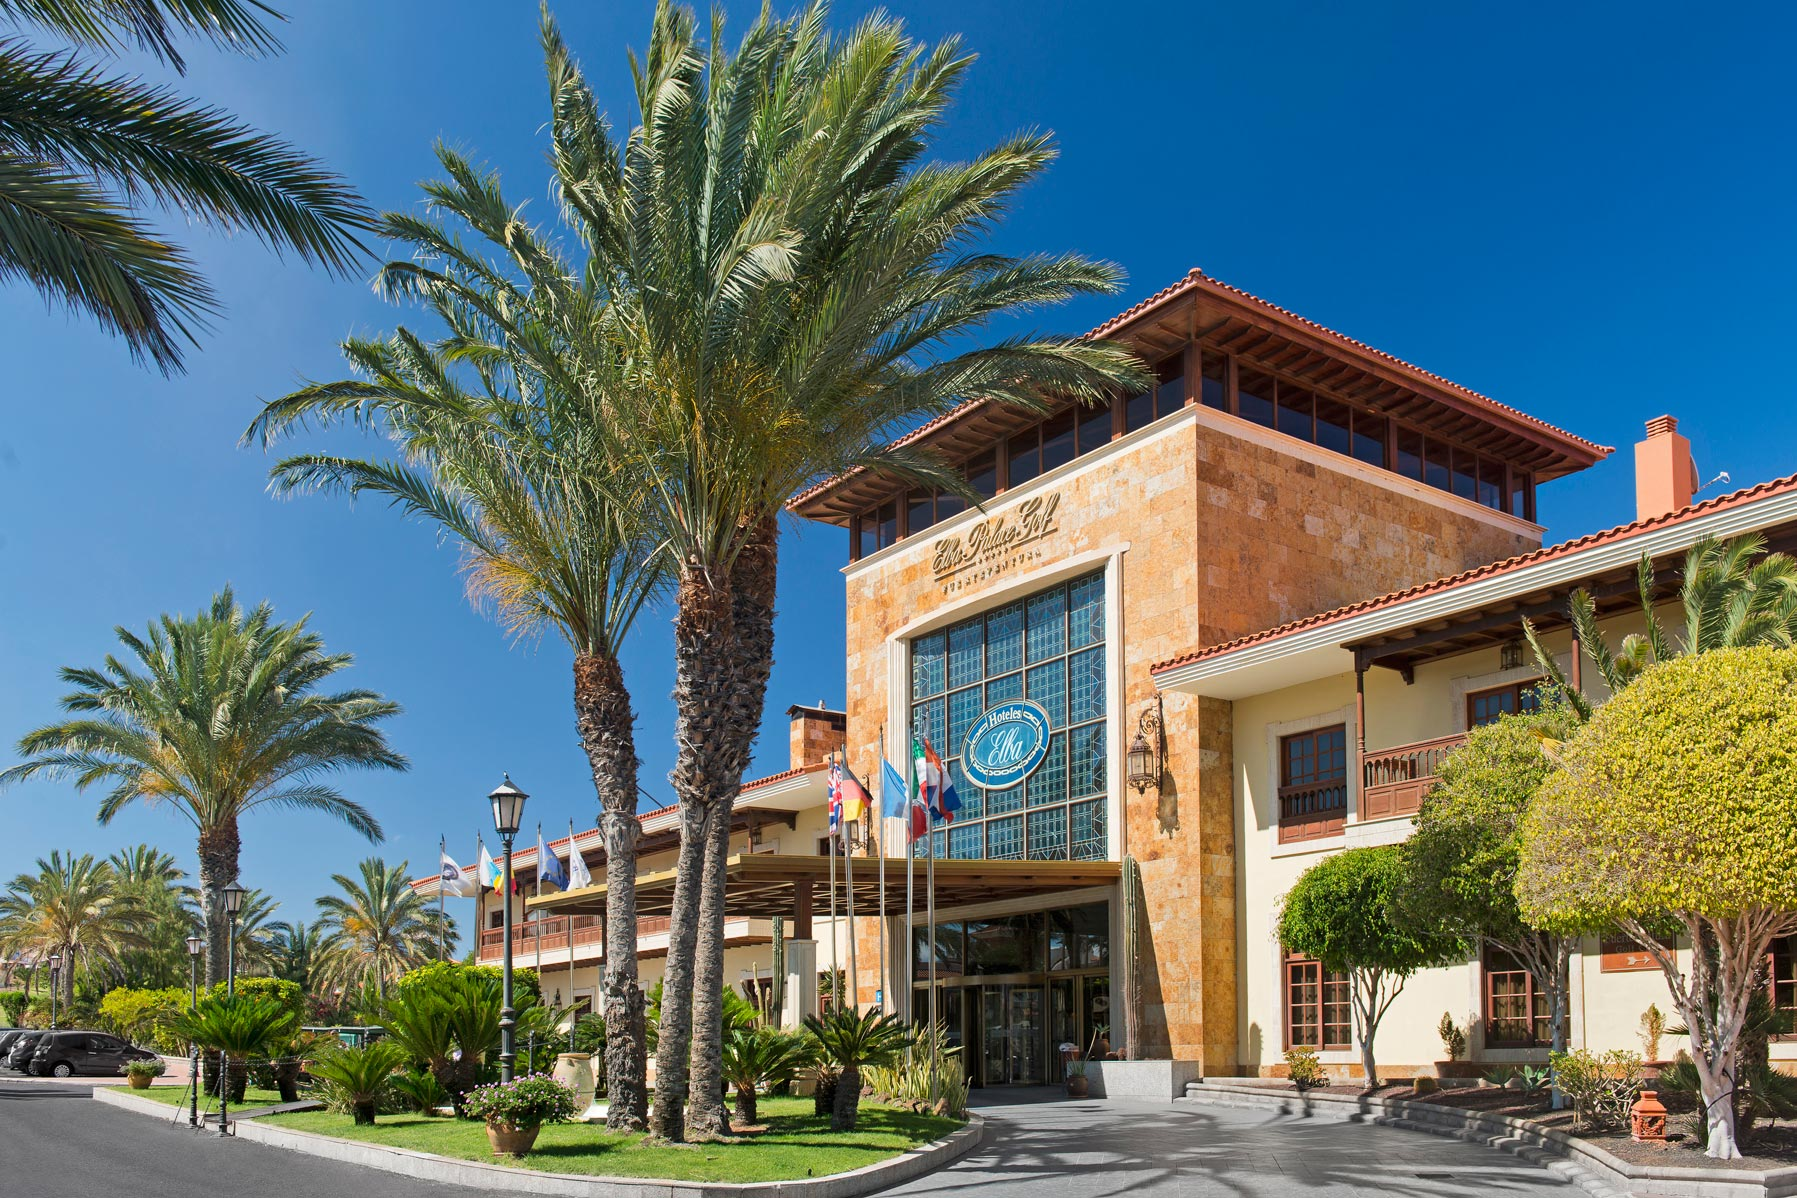 Hotel Elba Palace